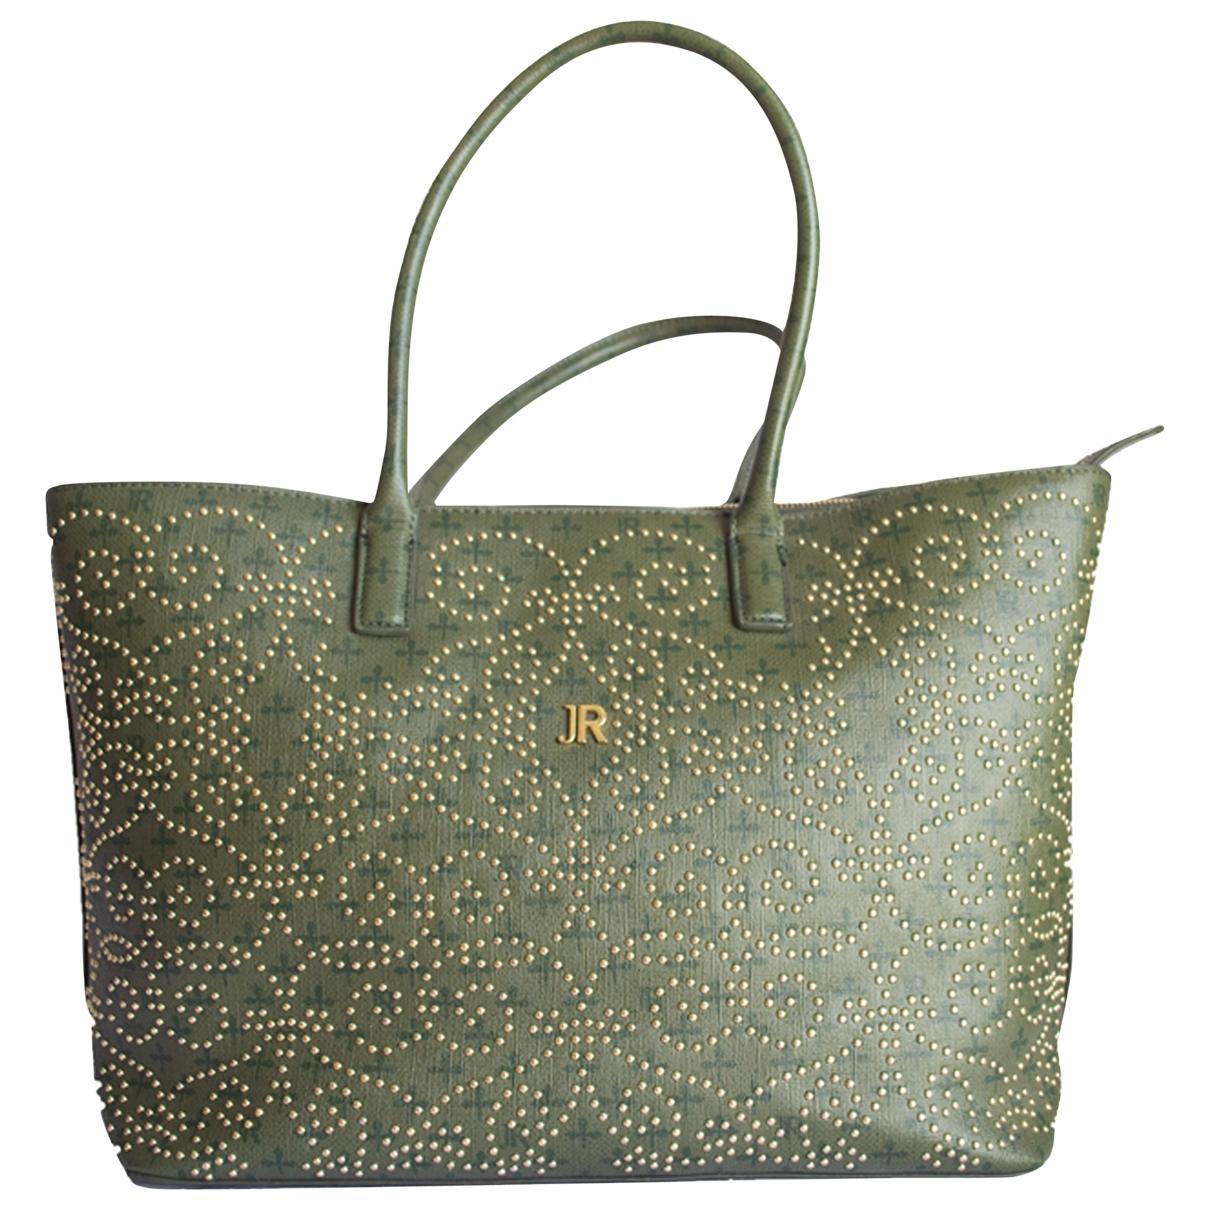 John Richmond \N Green handbag for Women \N